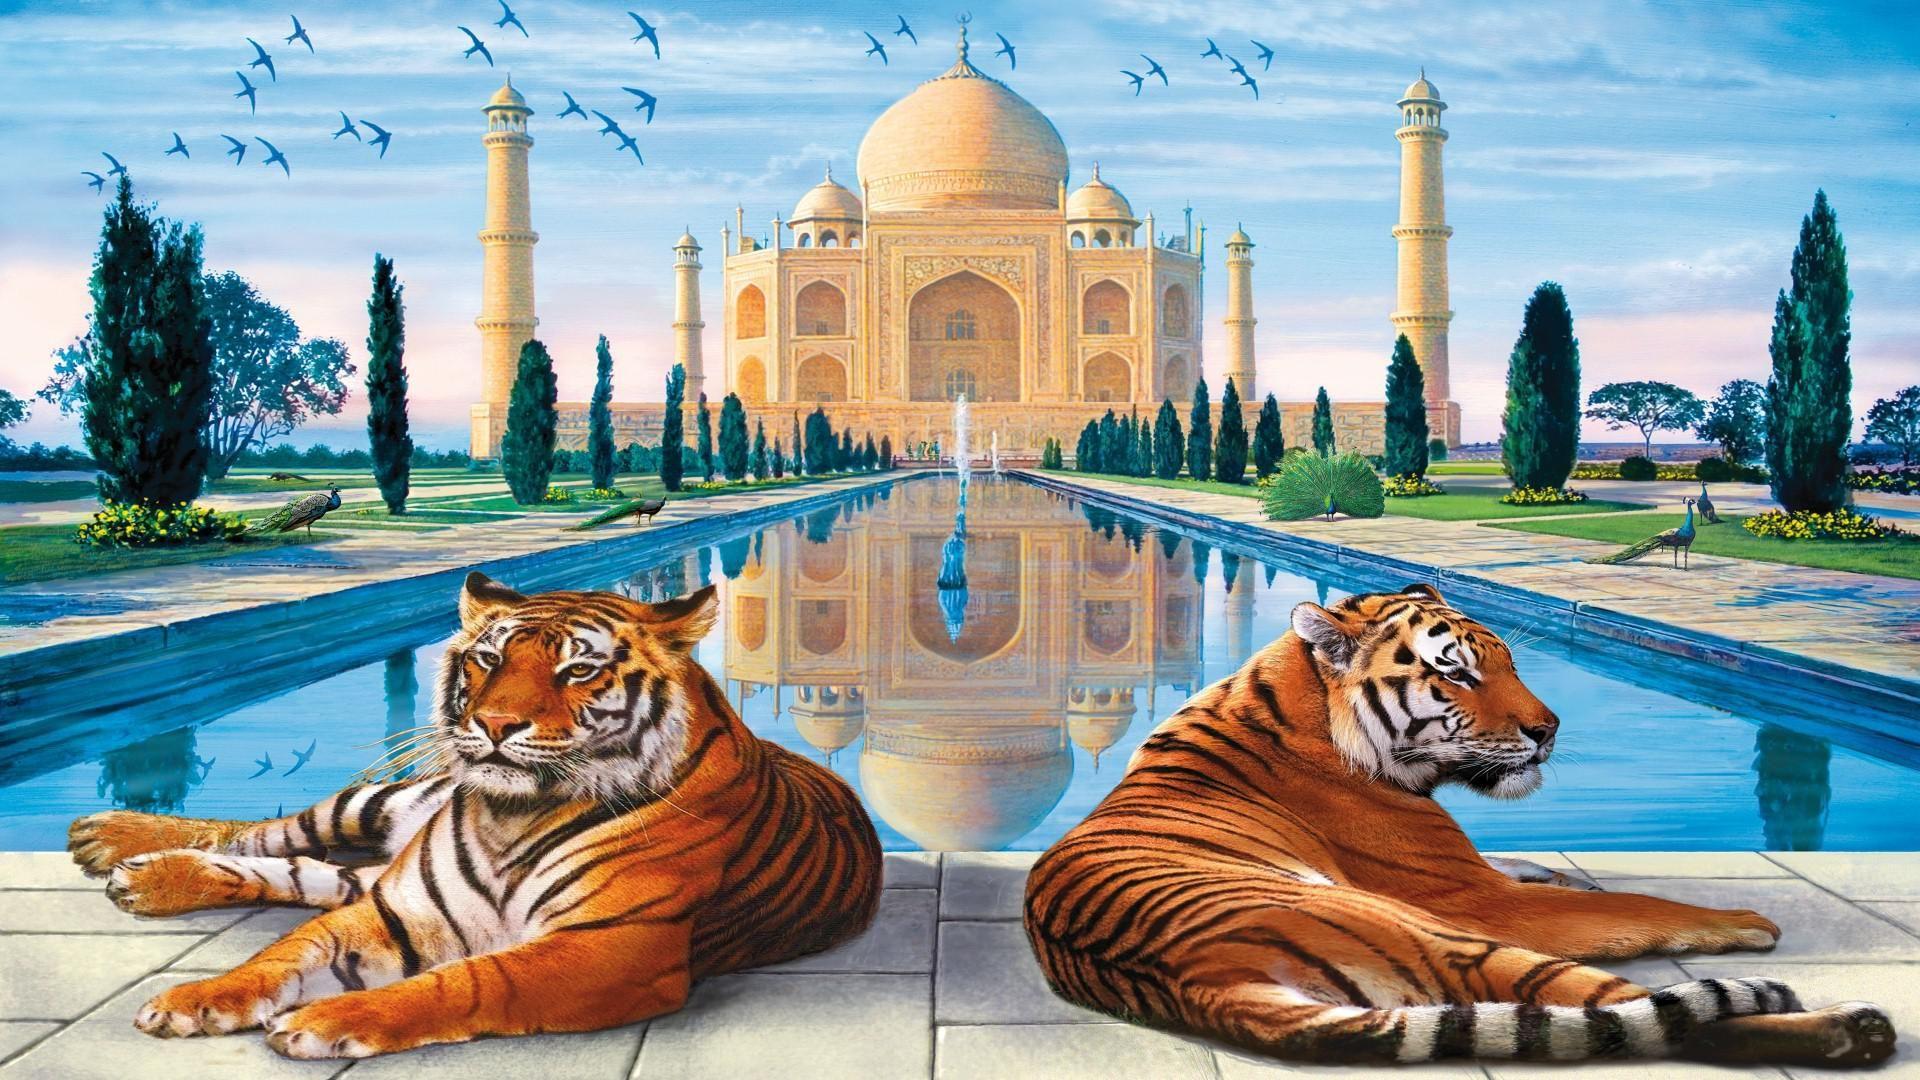 Taj Mahal Hd Desktop Wallpaper High Definition Mobile Hd